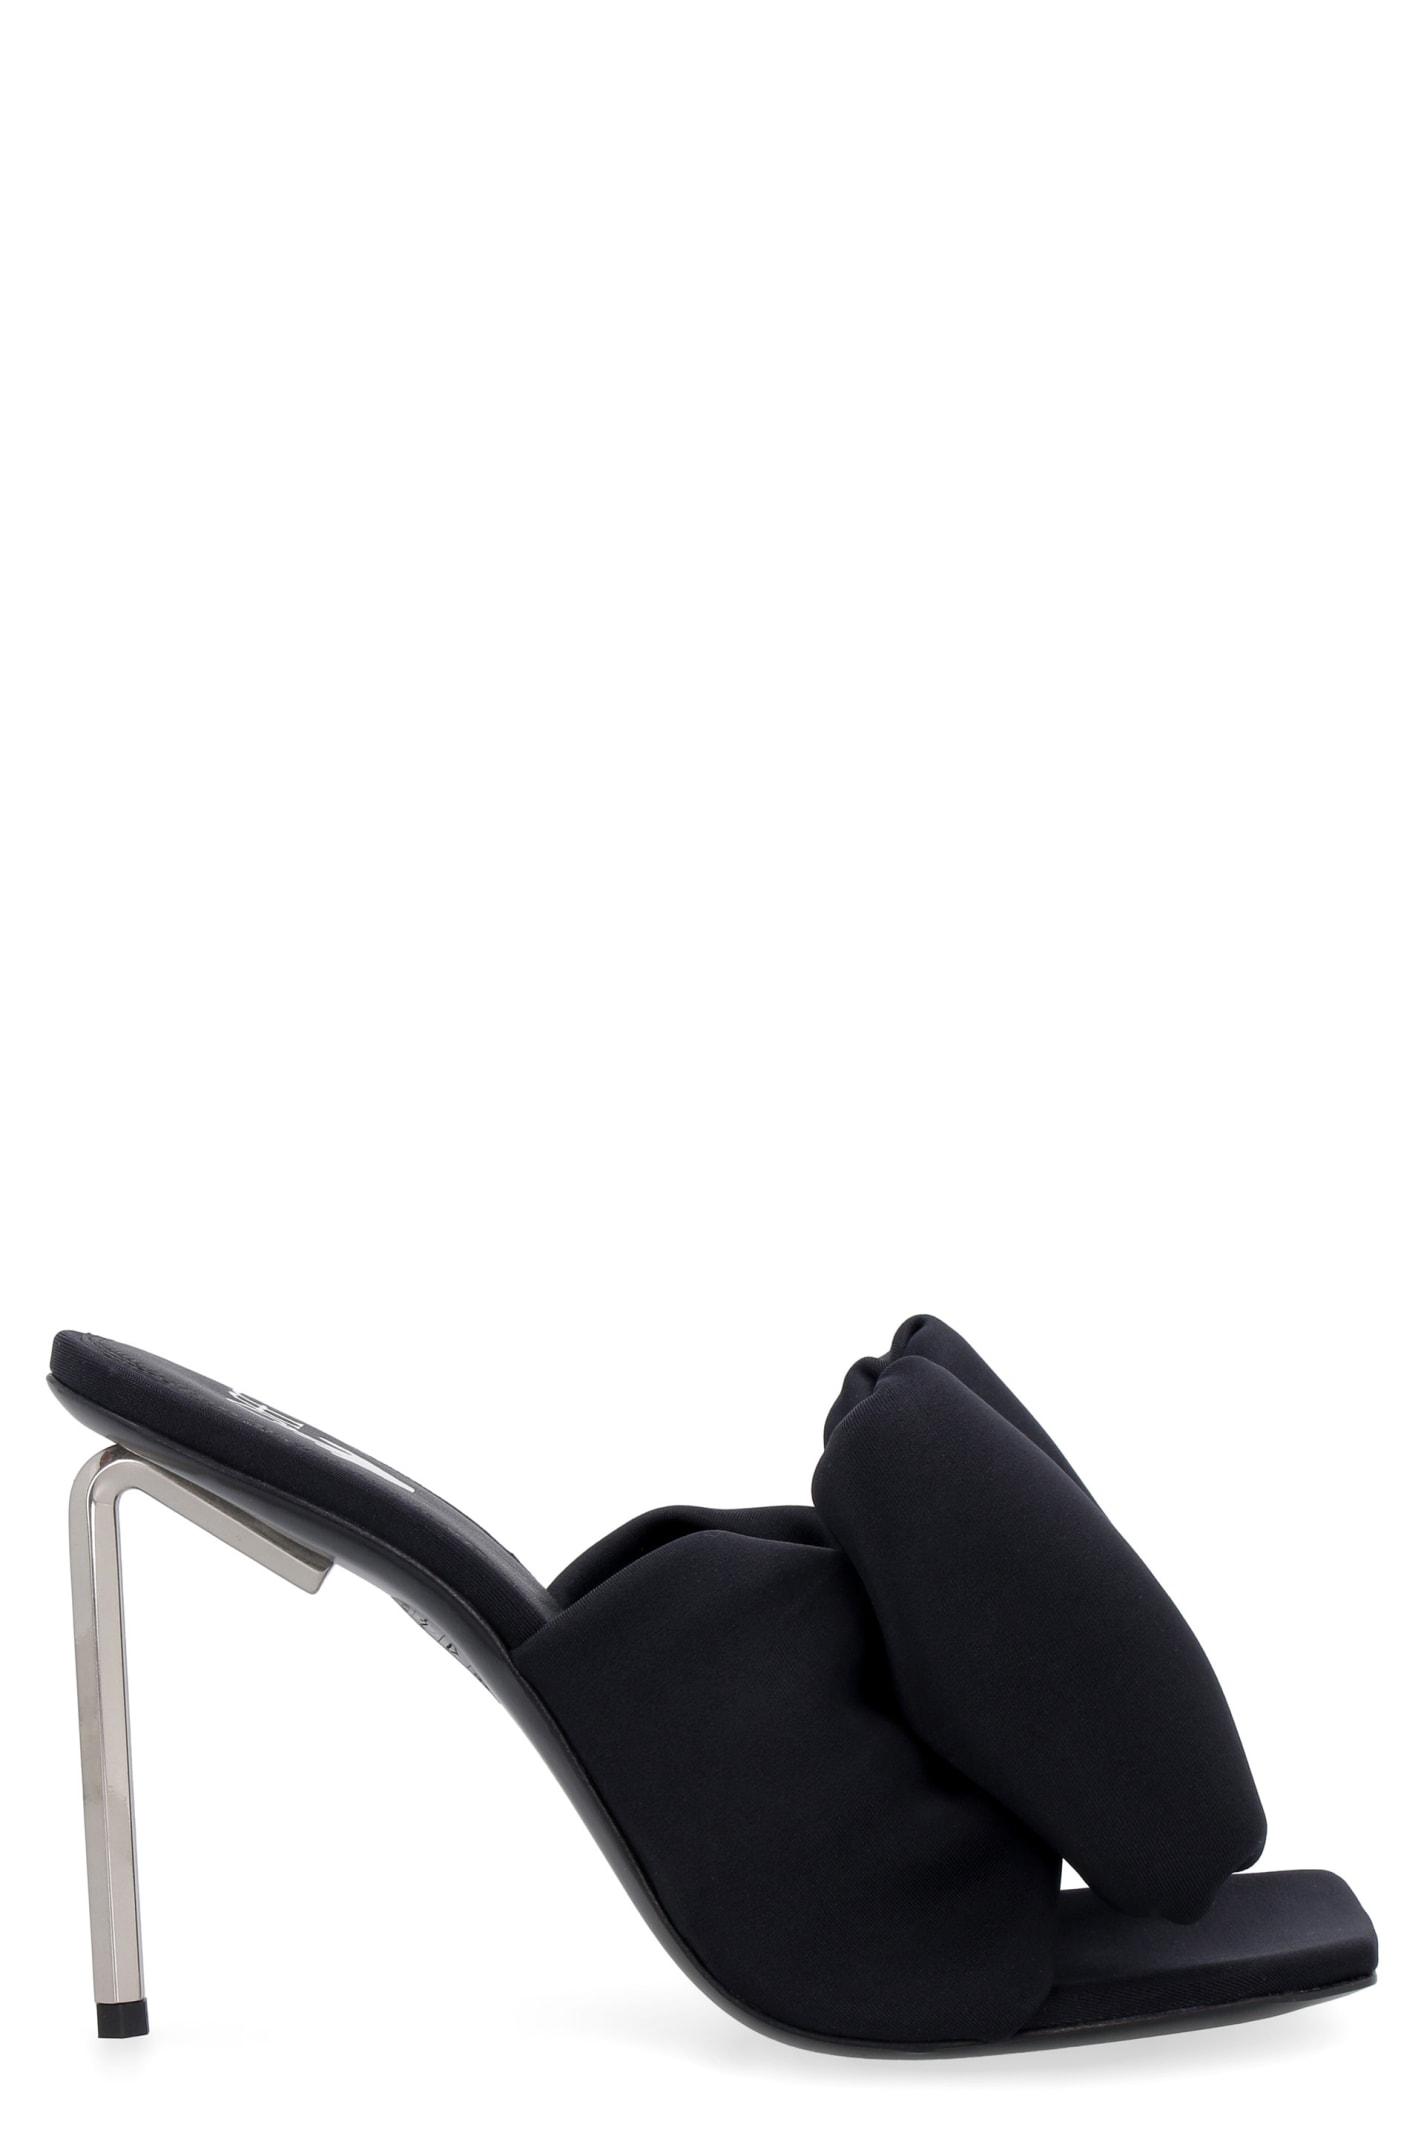 Off-White Allen Maxi-bow Detail Mules